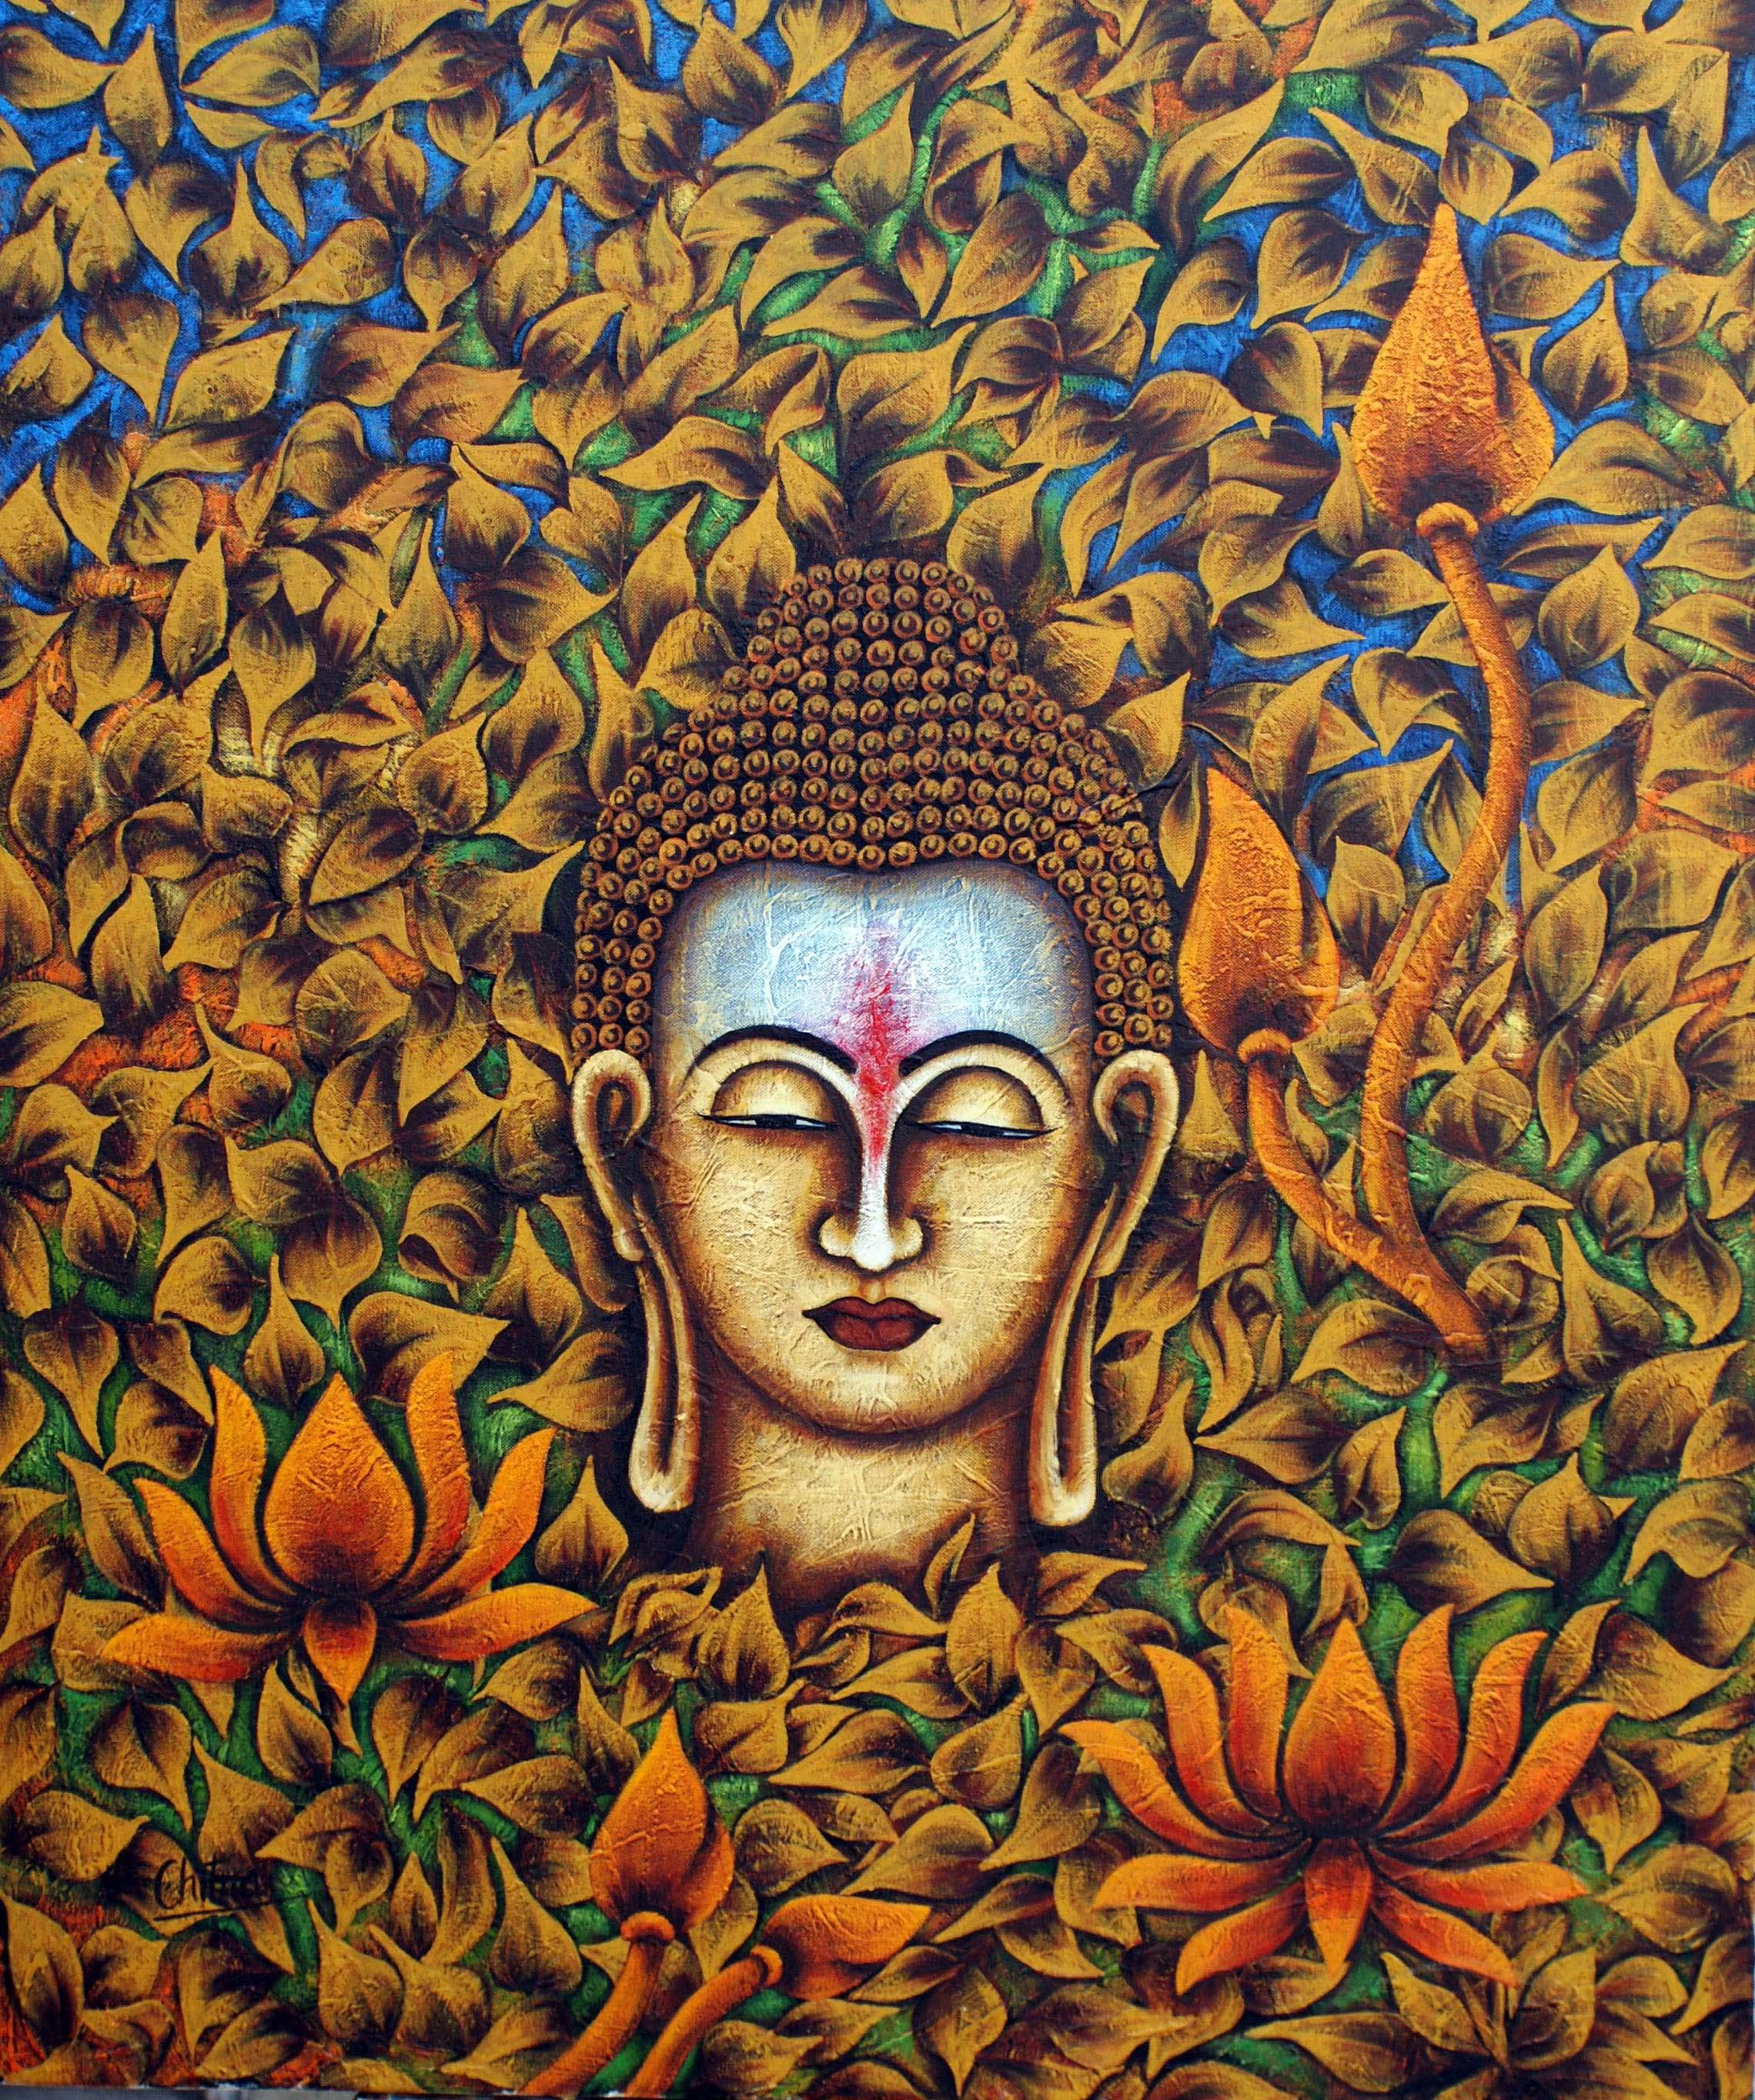 Wallpapersafari: Lord Buddha Wallpaper HD